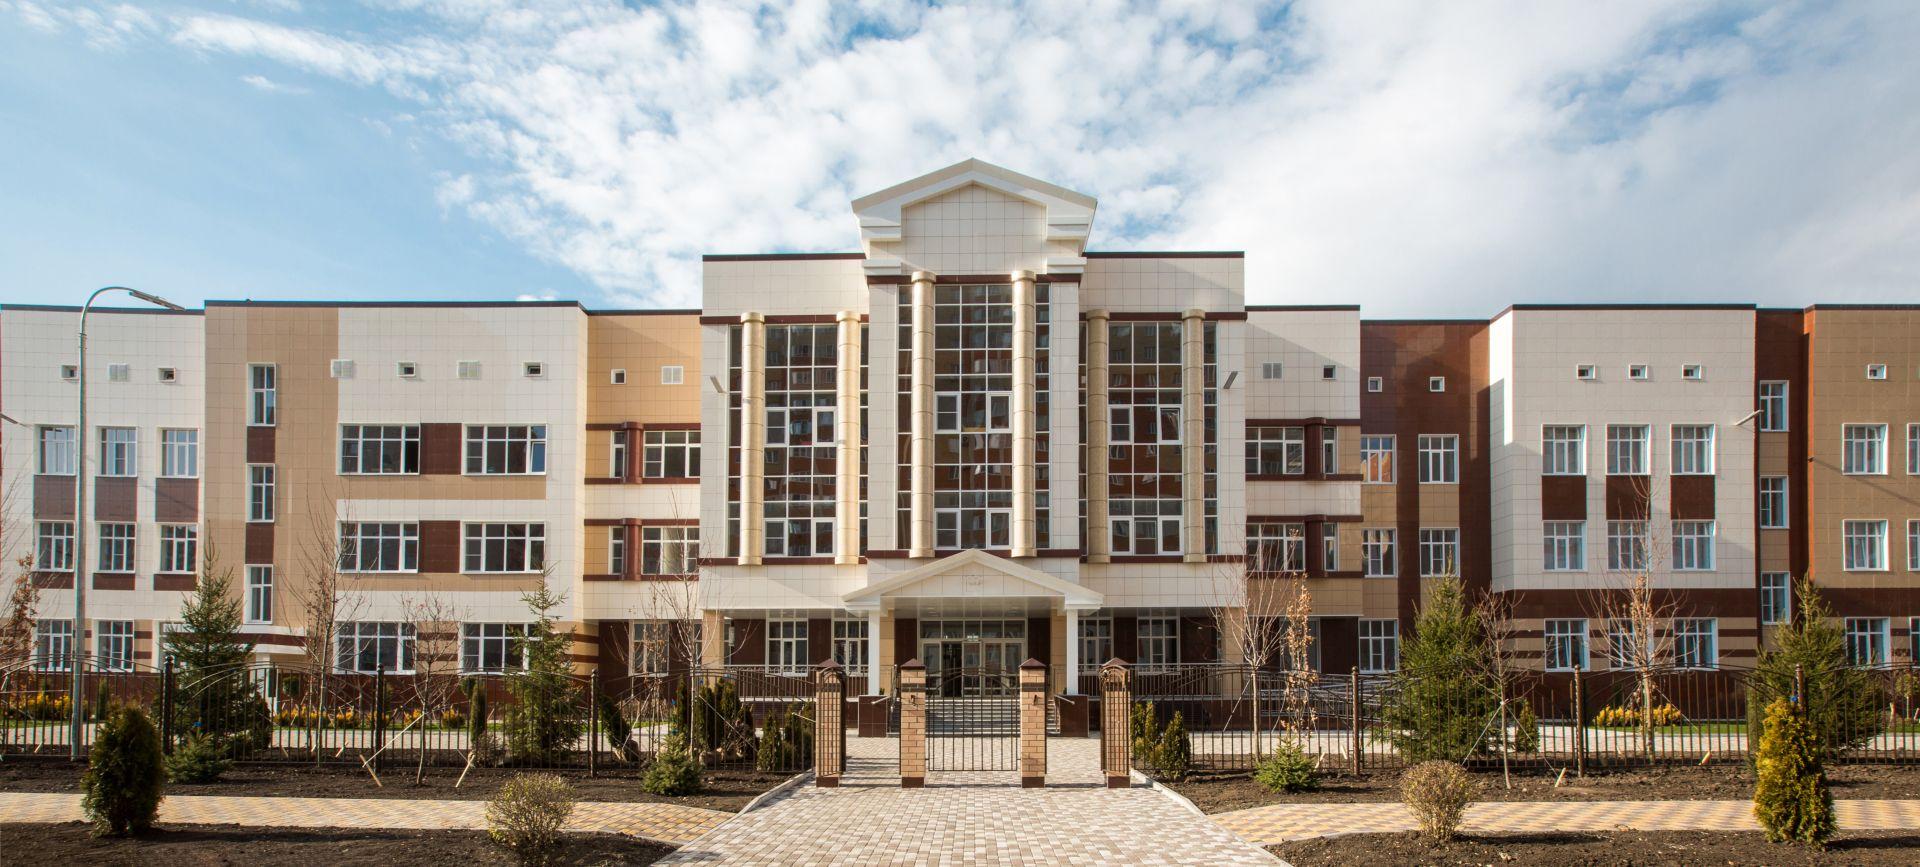 В Юго-Западном районе Ставрополя построят ещё одну школу